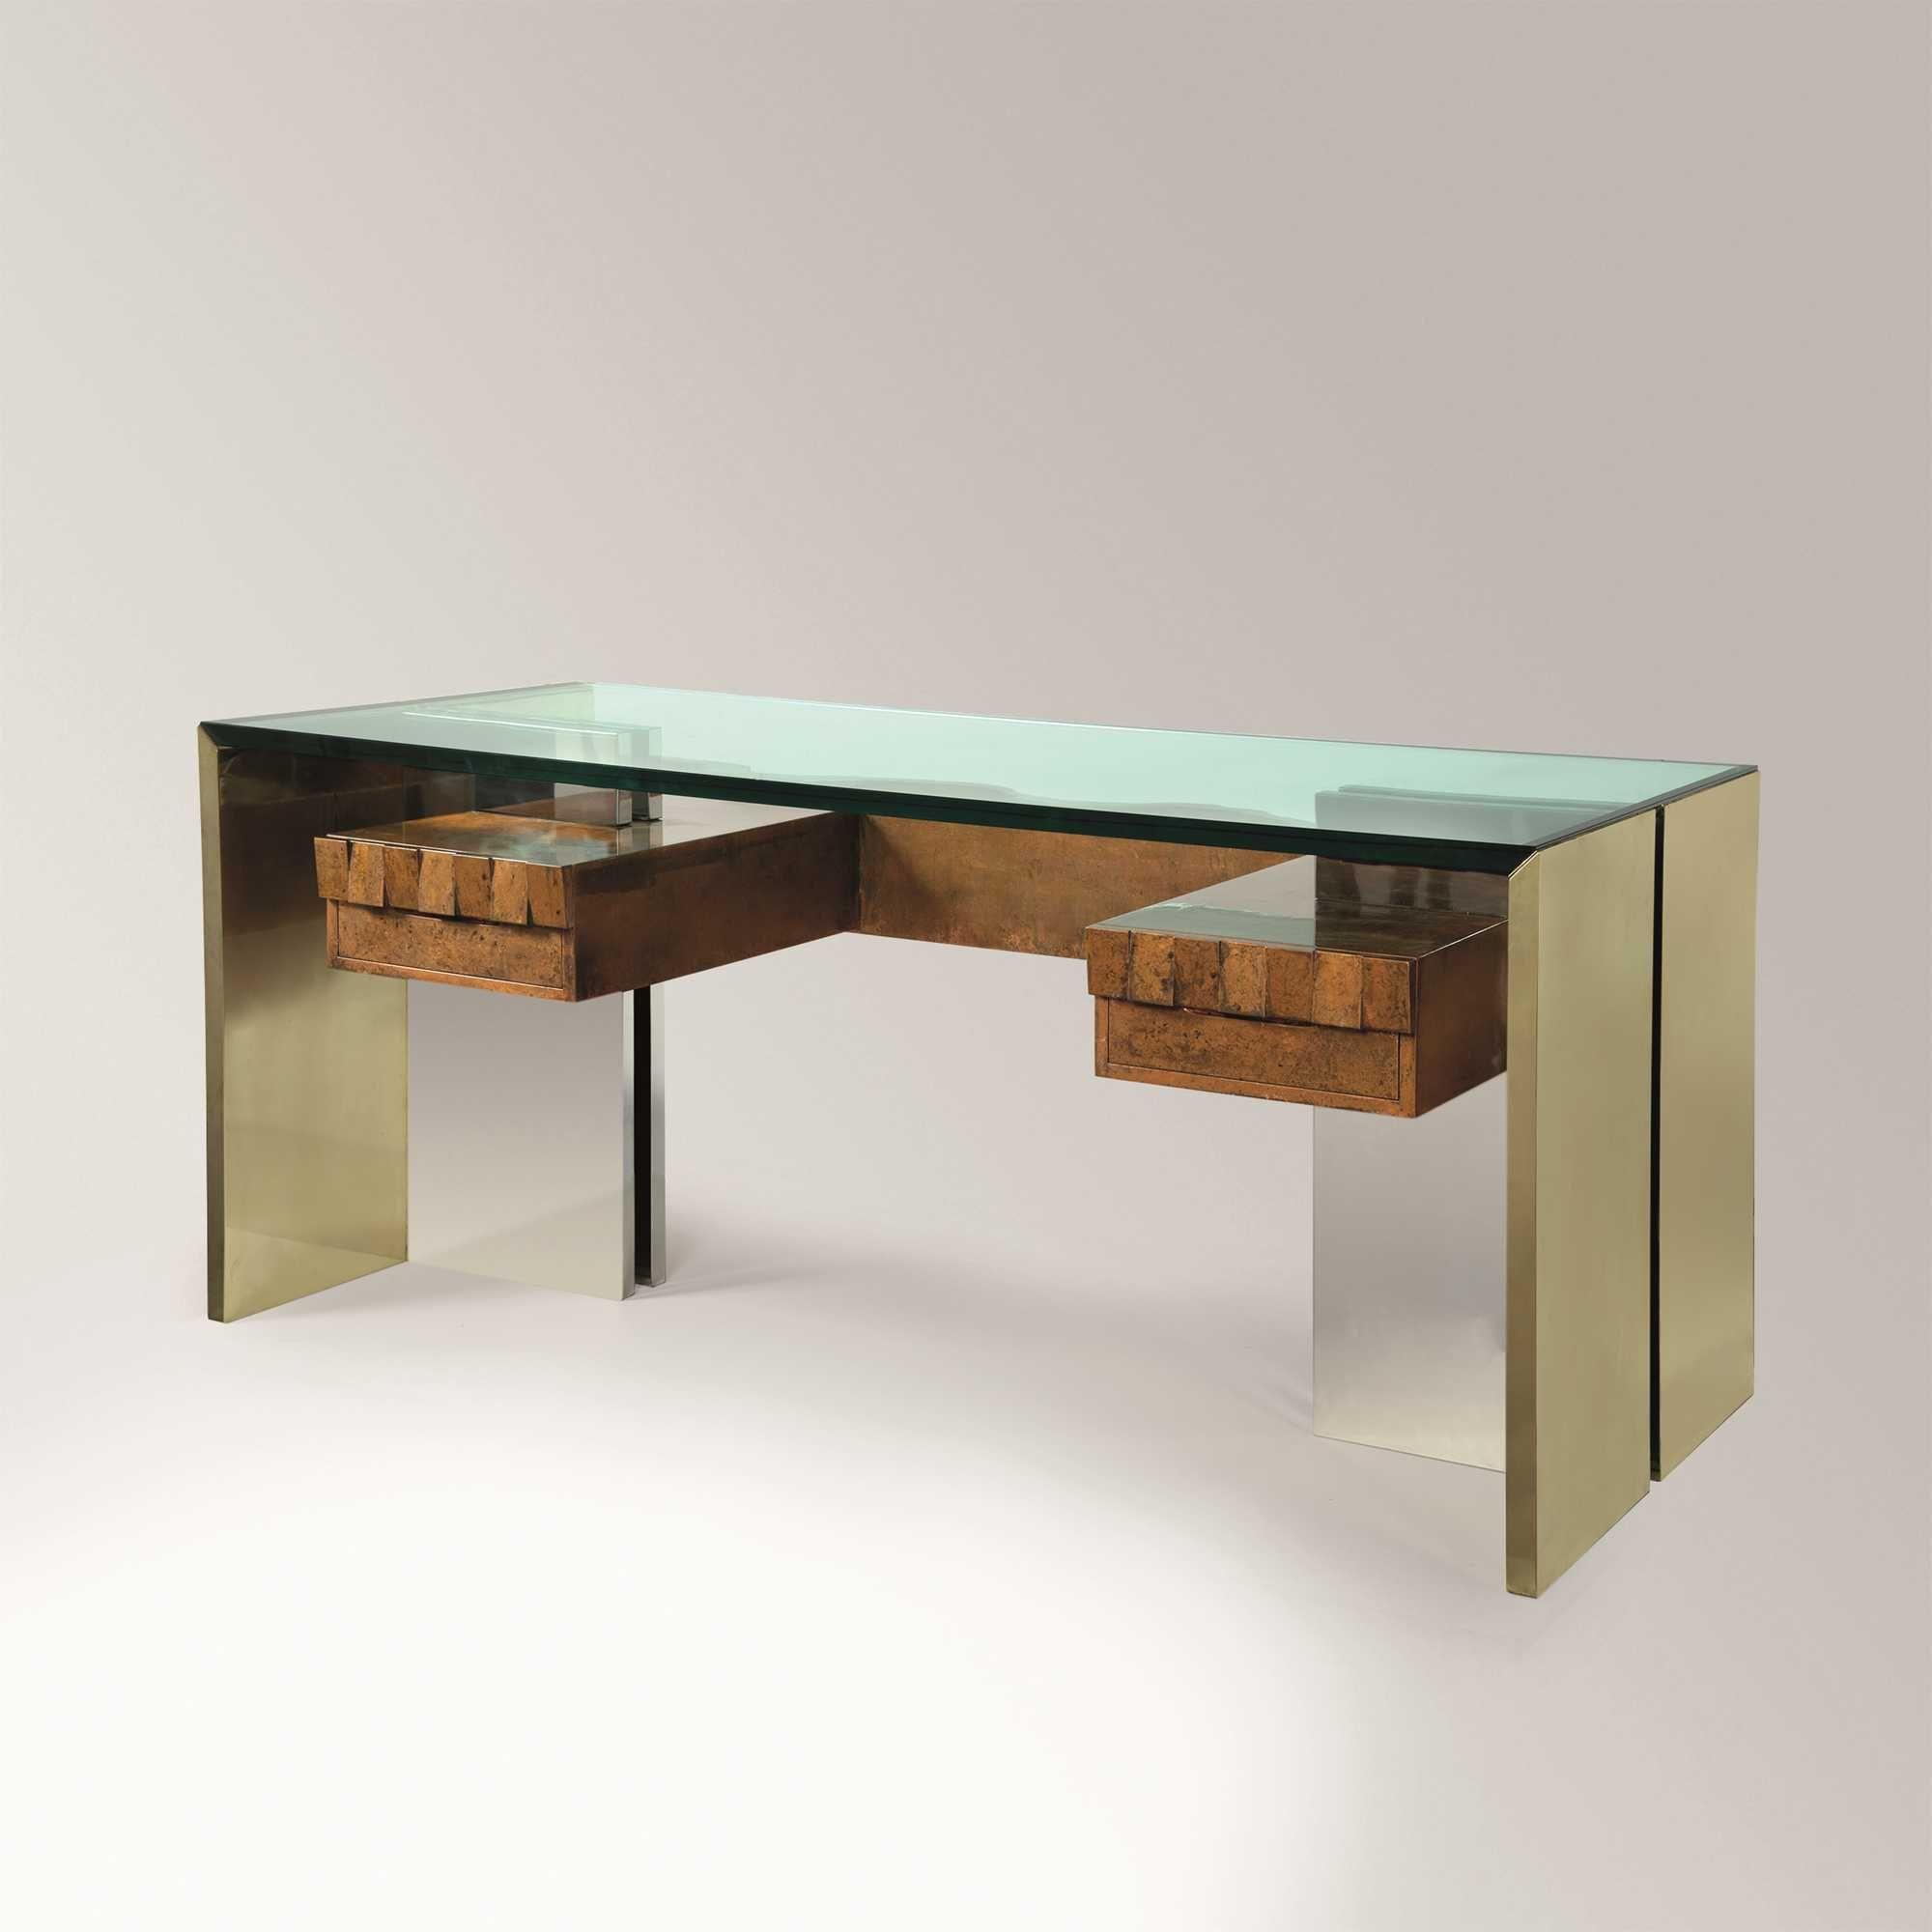 set winsome office desks home images designs table executive glass splendid design inspirational desk reception modern contemporary